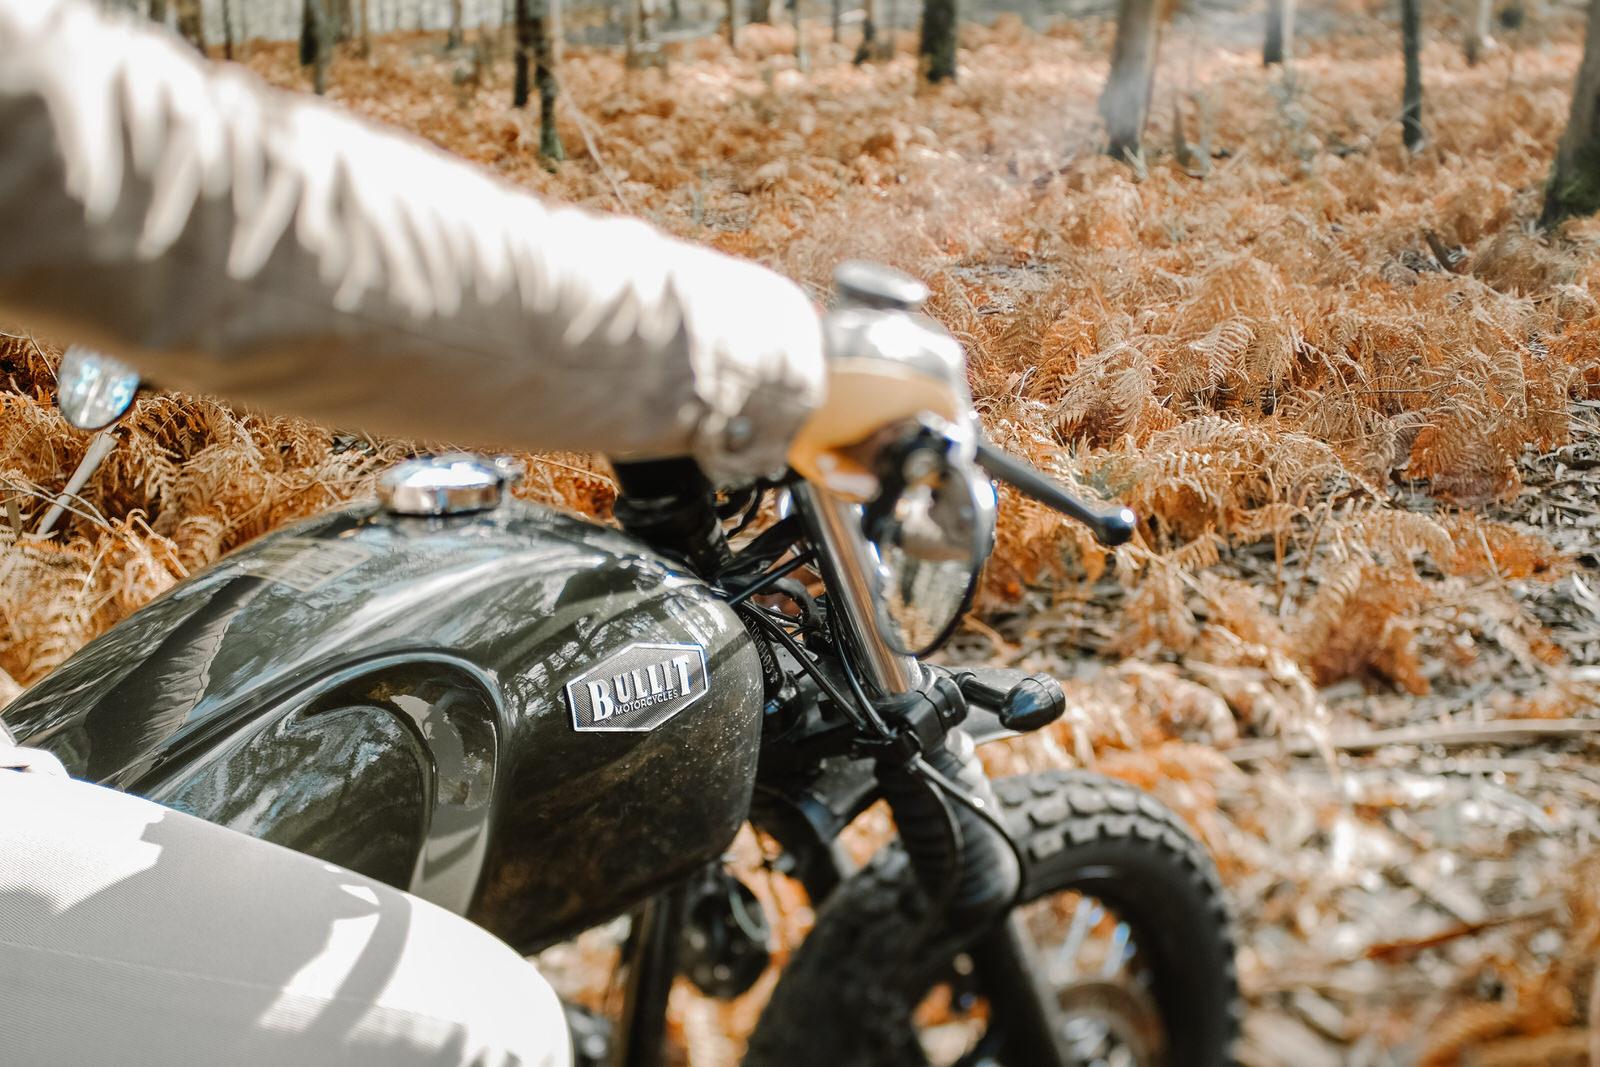 Motorcycles Bullit Brixton mutt mash fotógrafo motas rider Porto Portugal